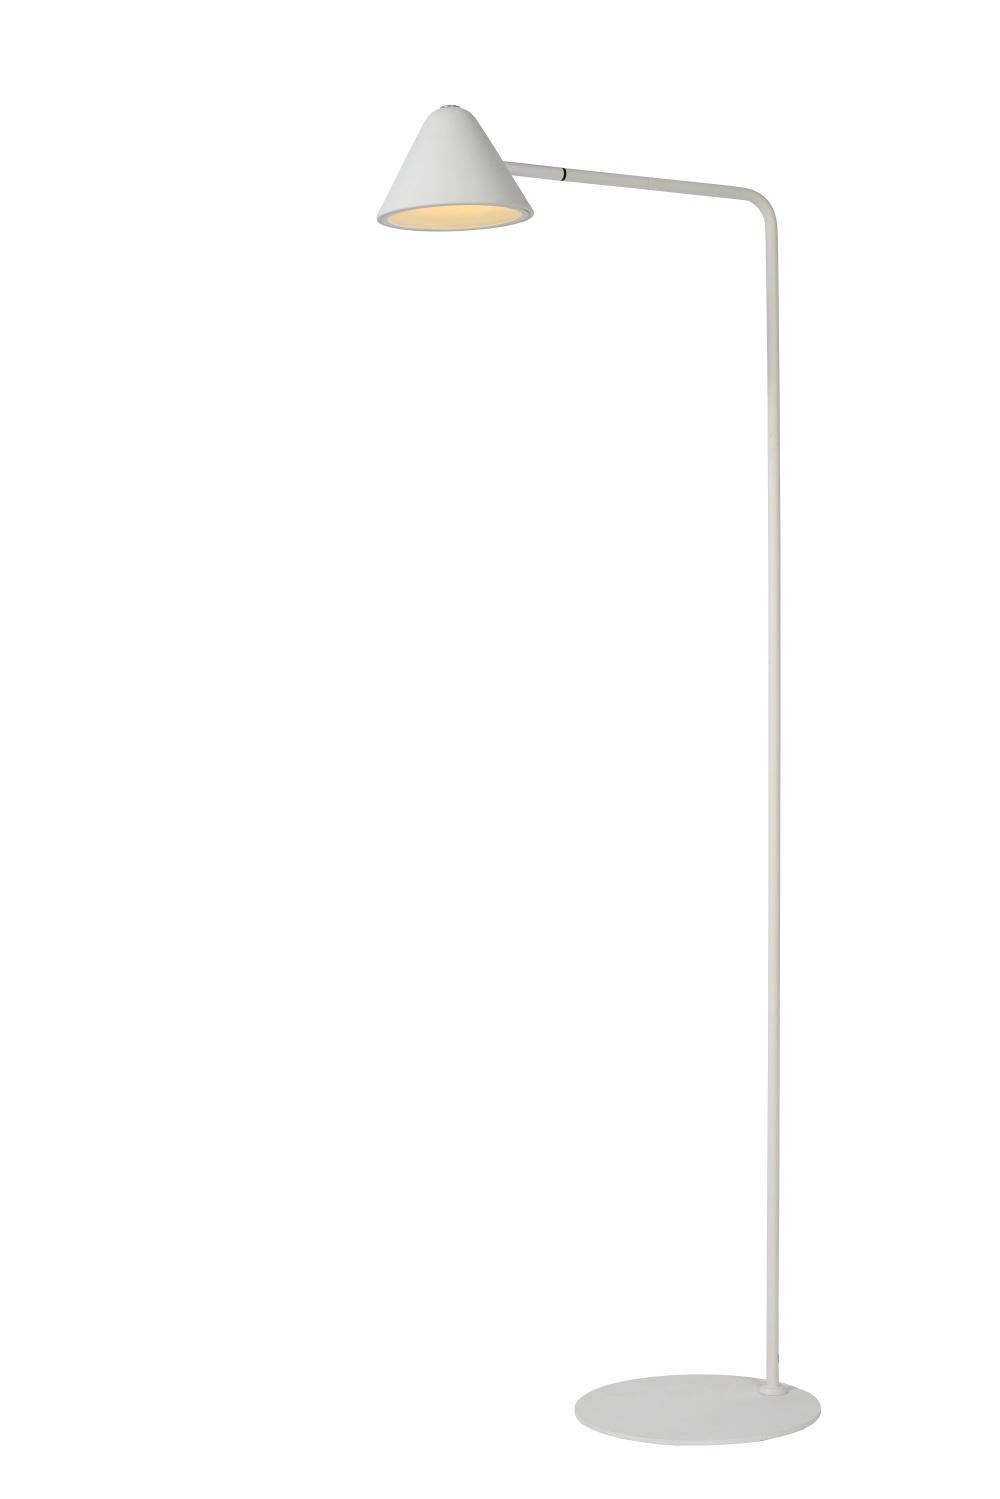 Lucide Devon Leeslamp 3w / Led H129 5m Blanc